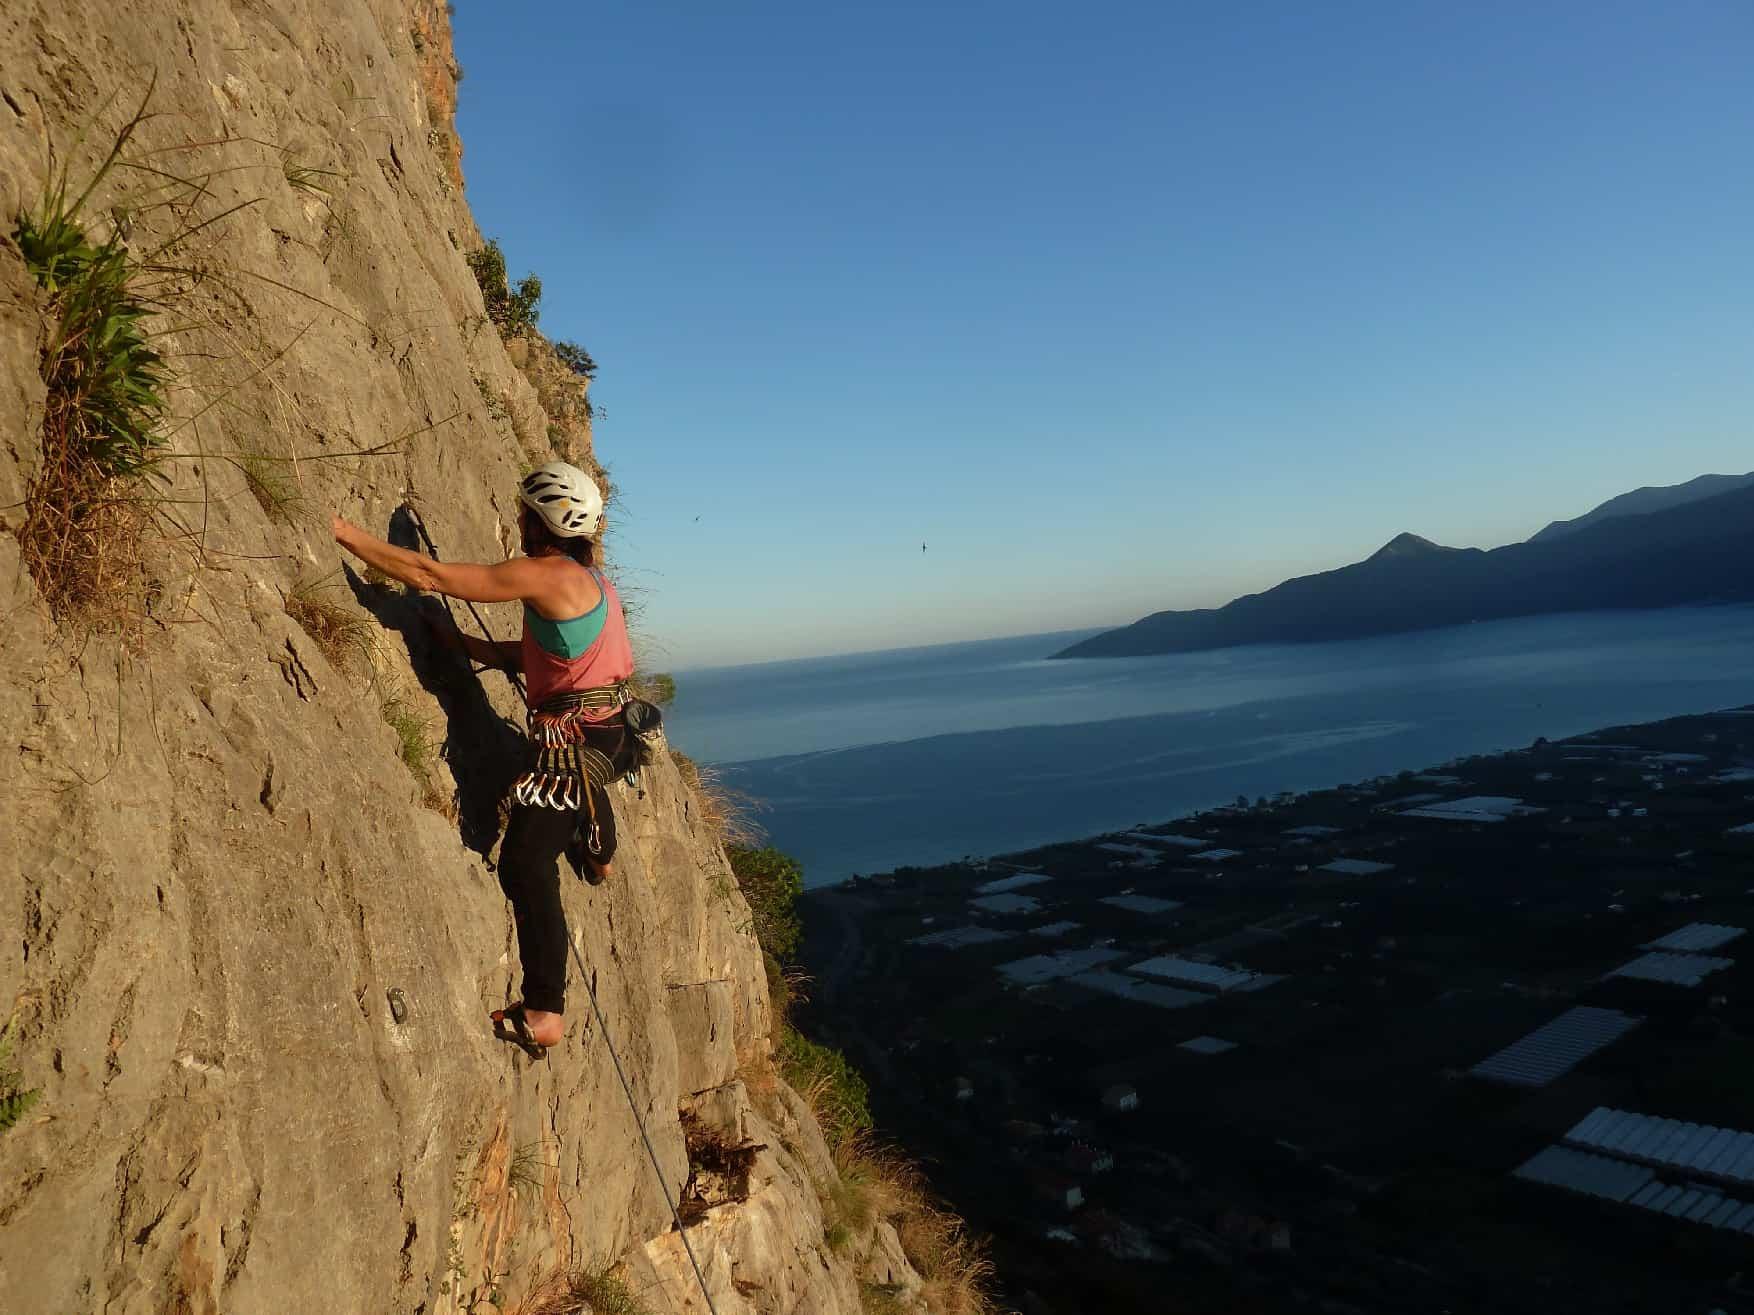 Klettern bei Leonidio